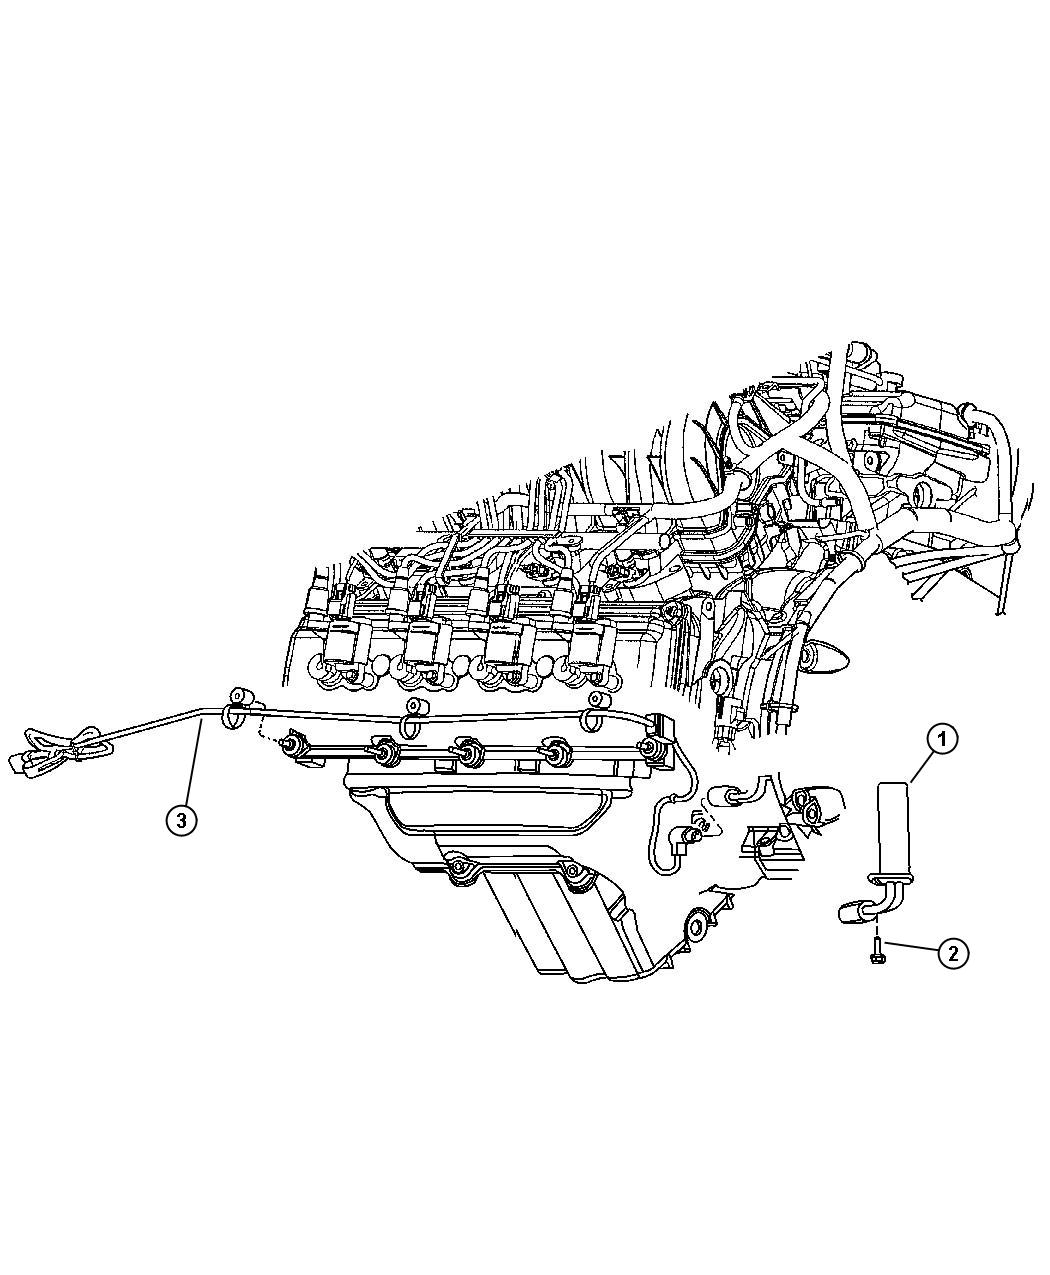 2005 Chrysler 300 Cord  Engine Block Heater  For 5 7l